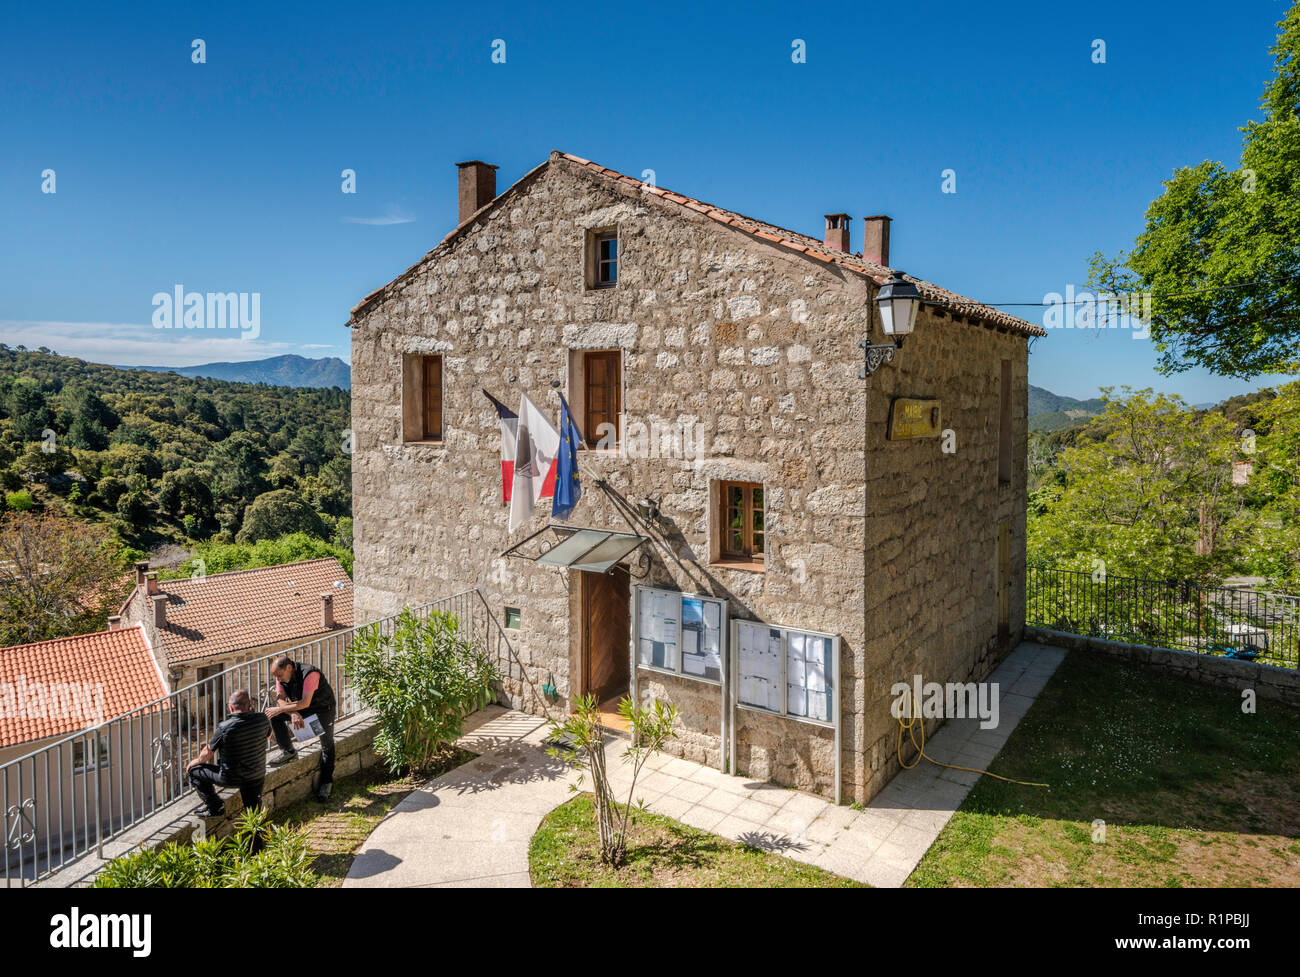 Two local men at Town Hall in village of Aullene, Alta Rocca microregion, Corse-du-Sud, Corsica, France - Stock Image